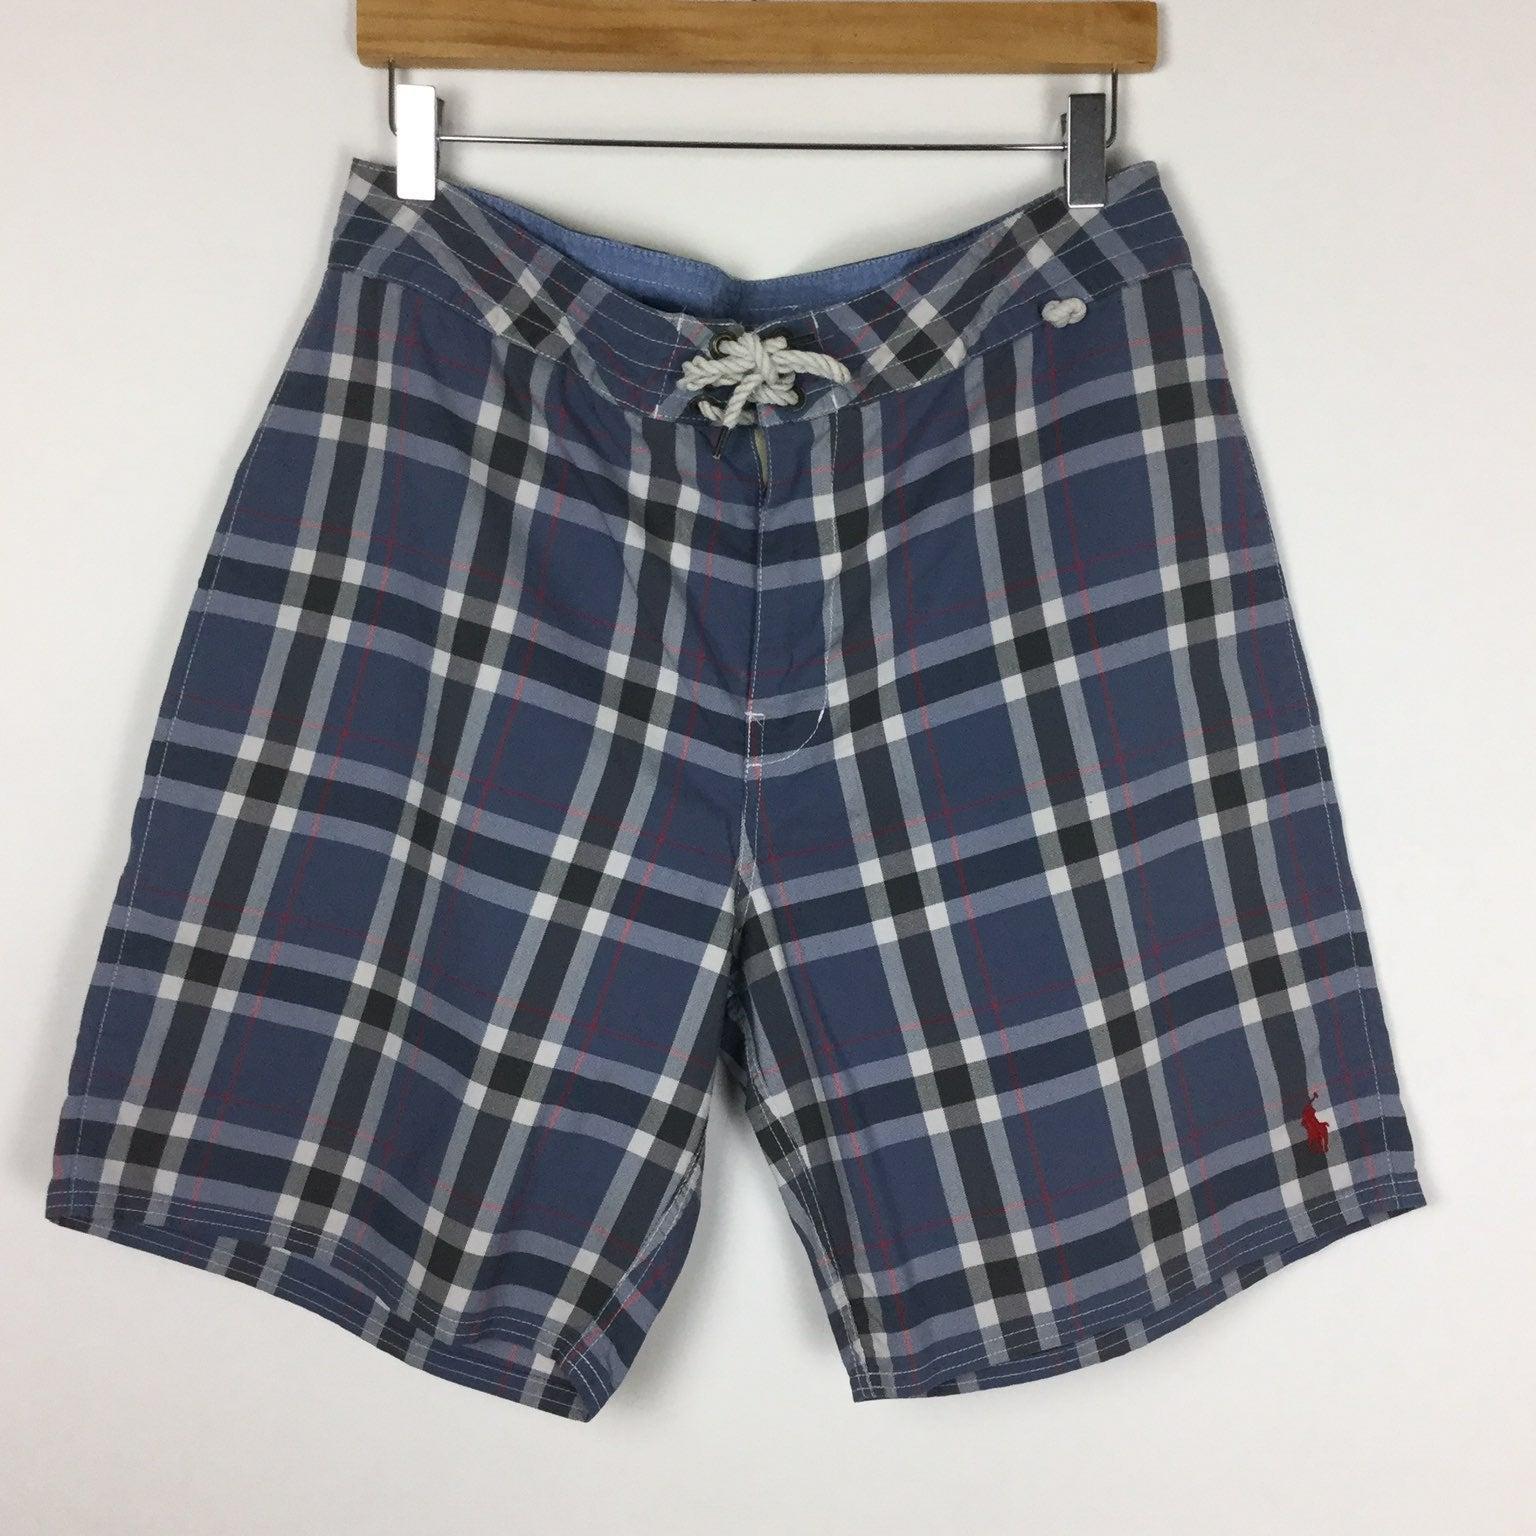 Polo By Ralph Lauren Trunks Size 34